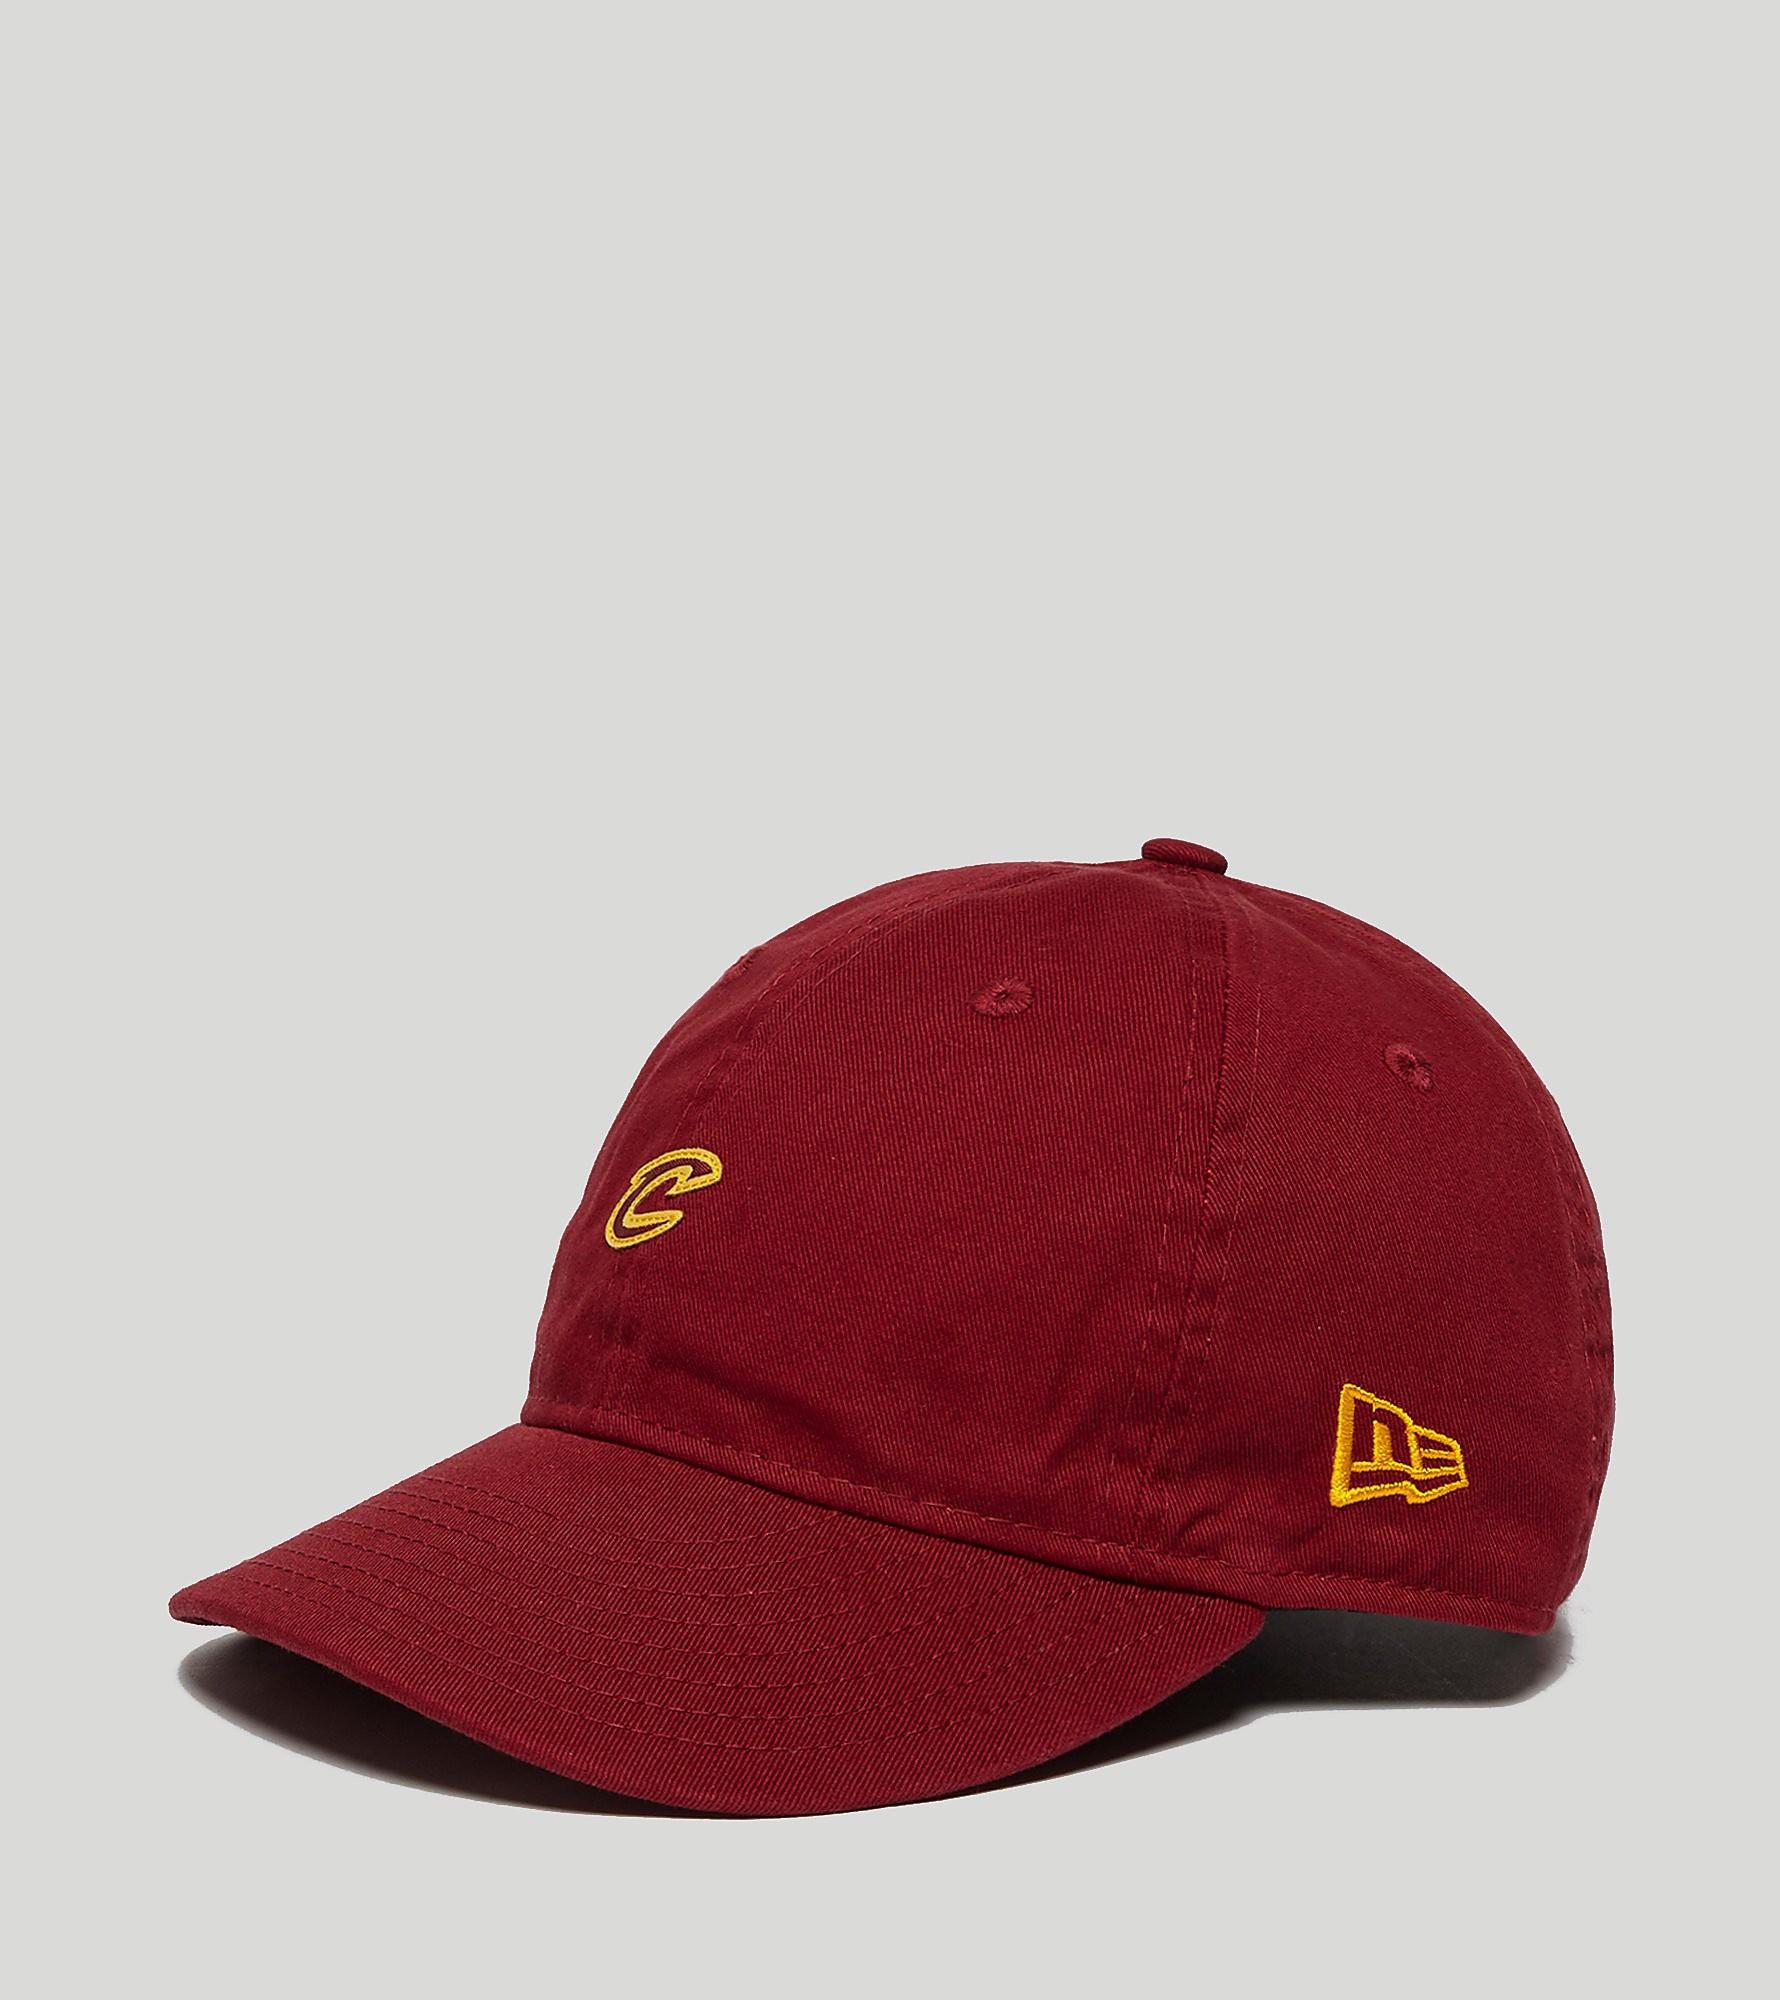 New Era 9FIFTY Cavs Strapback Cap